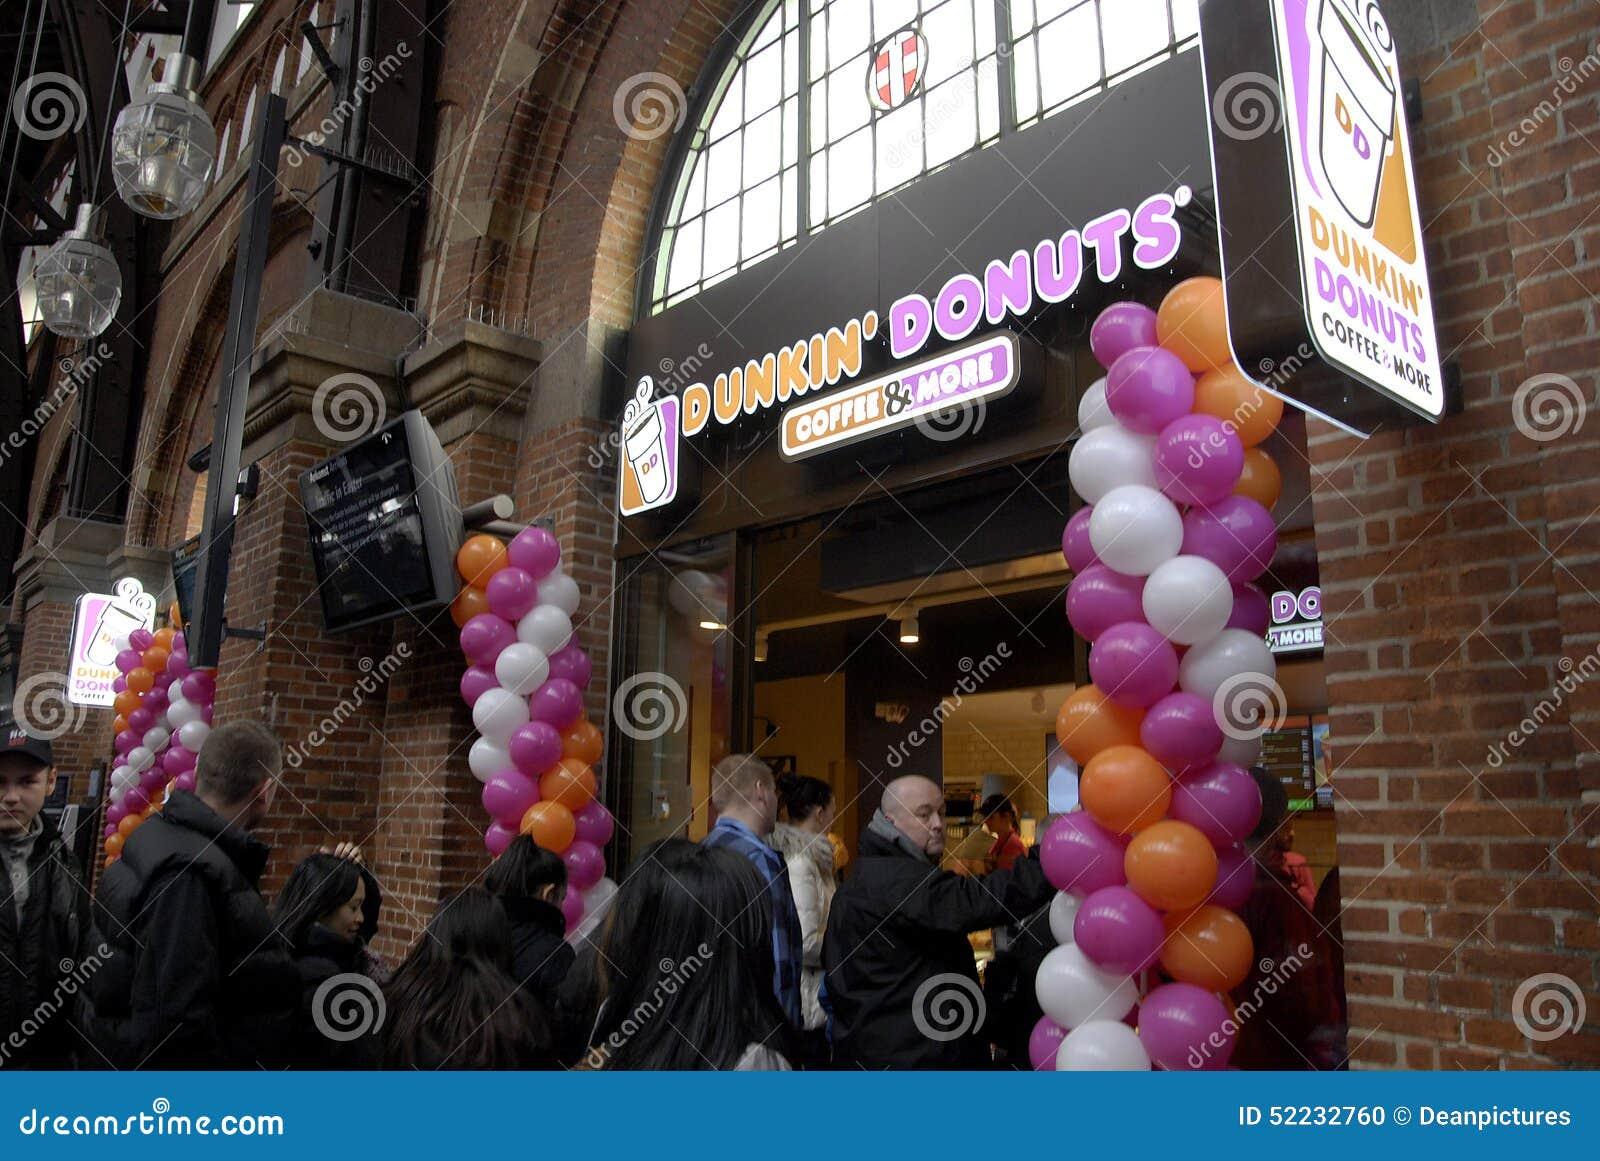 Buy Dunkin donuts stock?